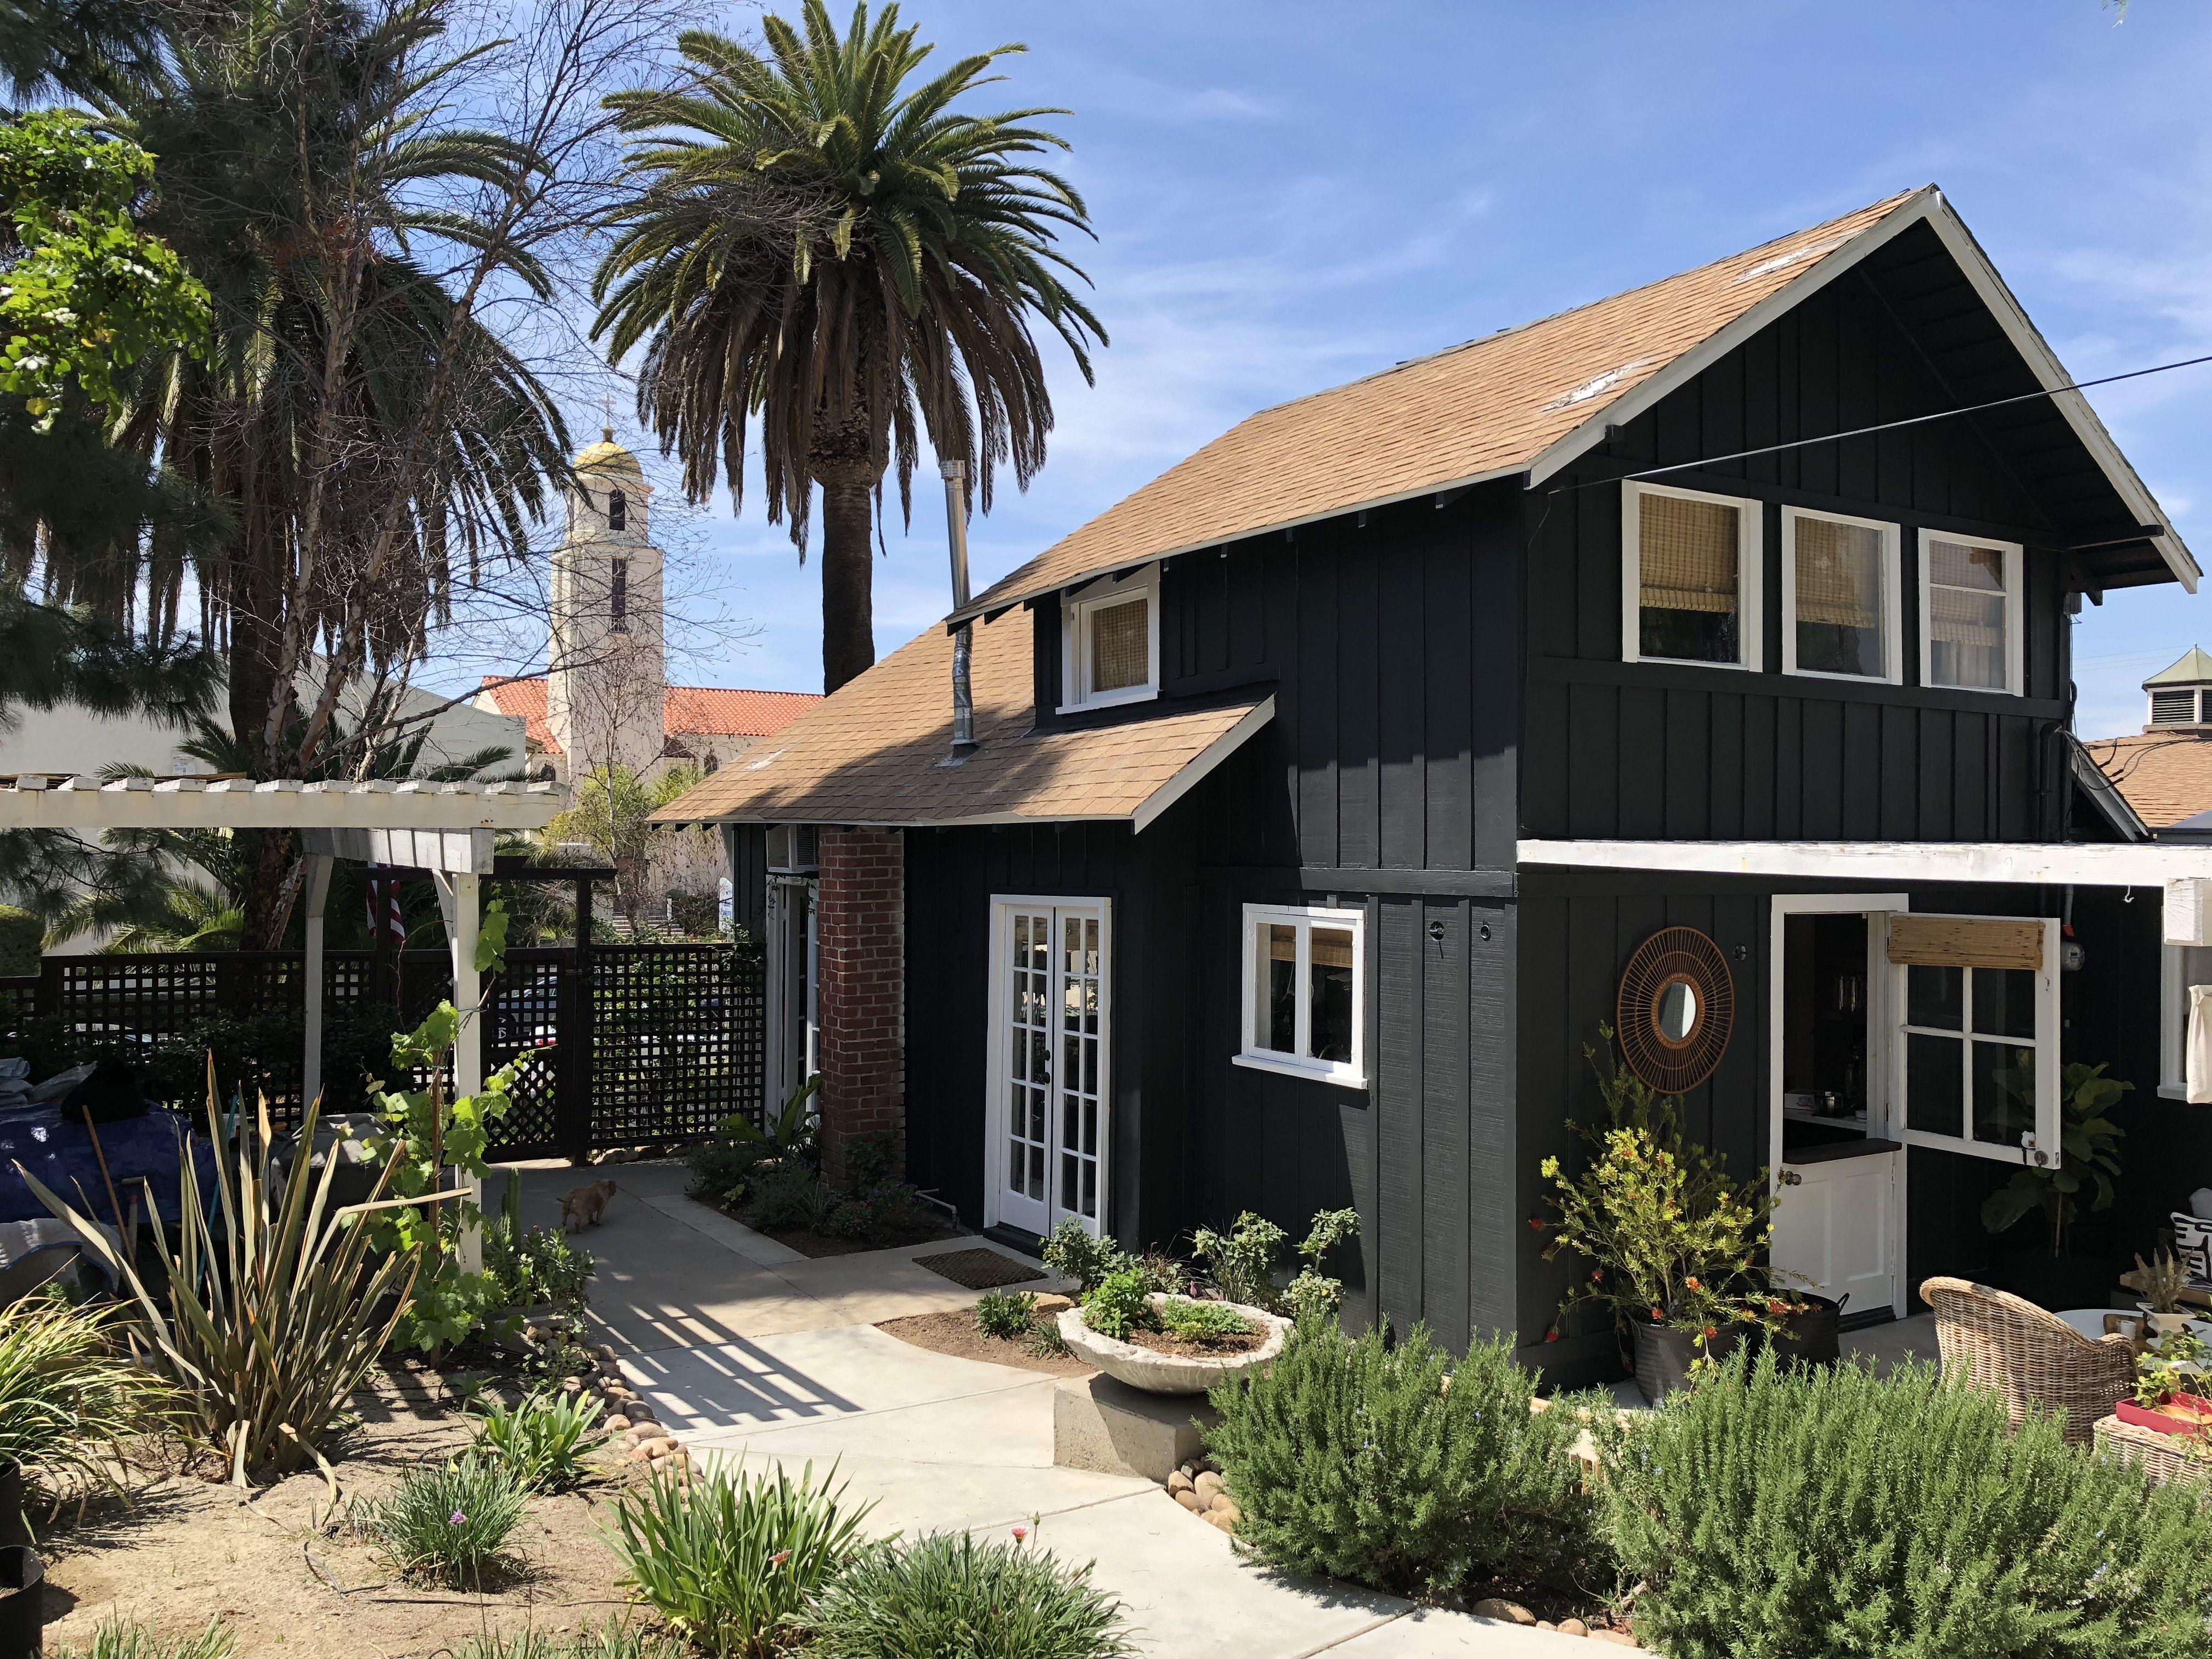 Our Black House Love La Mesa Ca Sw Greenblack Sw Pure White House Cladding Black House Exterior Exterior House Colors